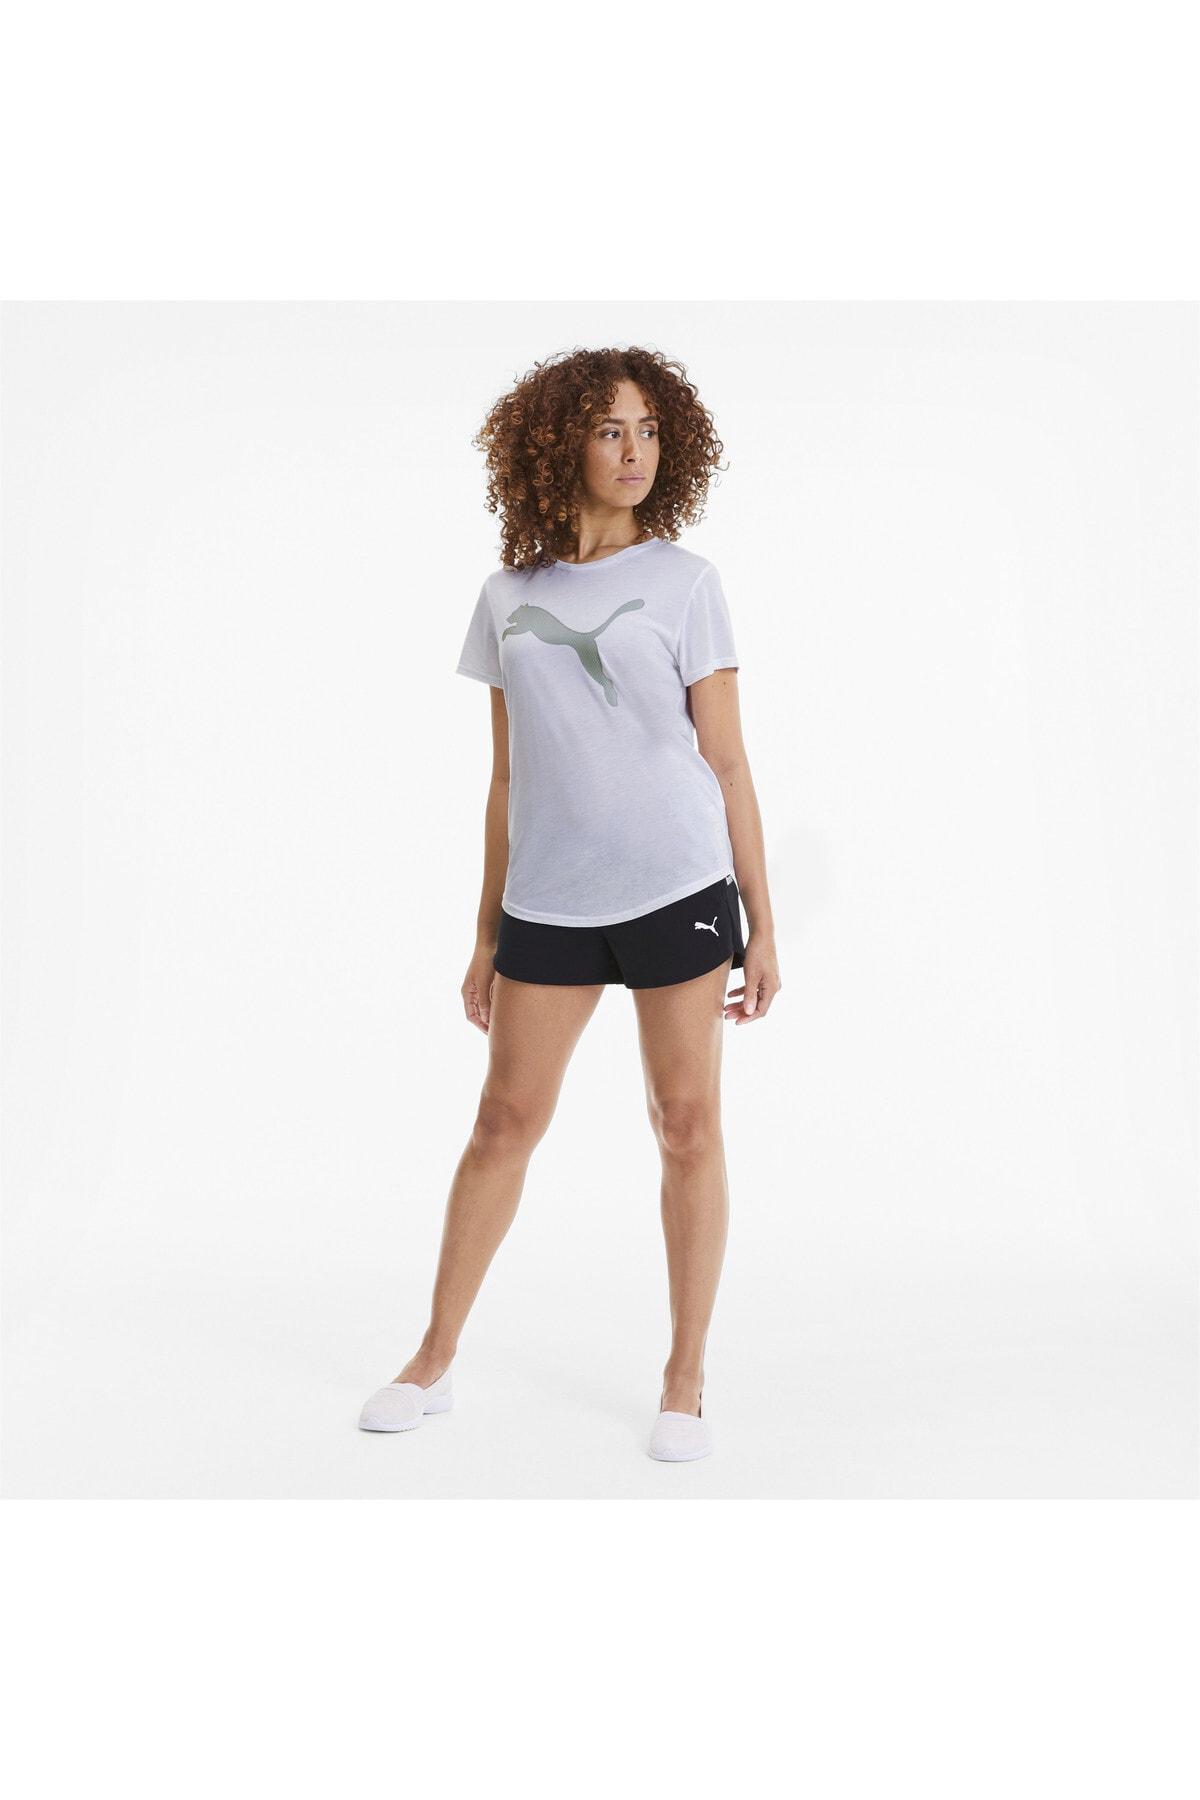 Puma Evostripe Kadın Tişört - 58124102 2